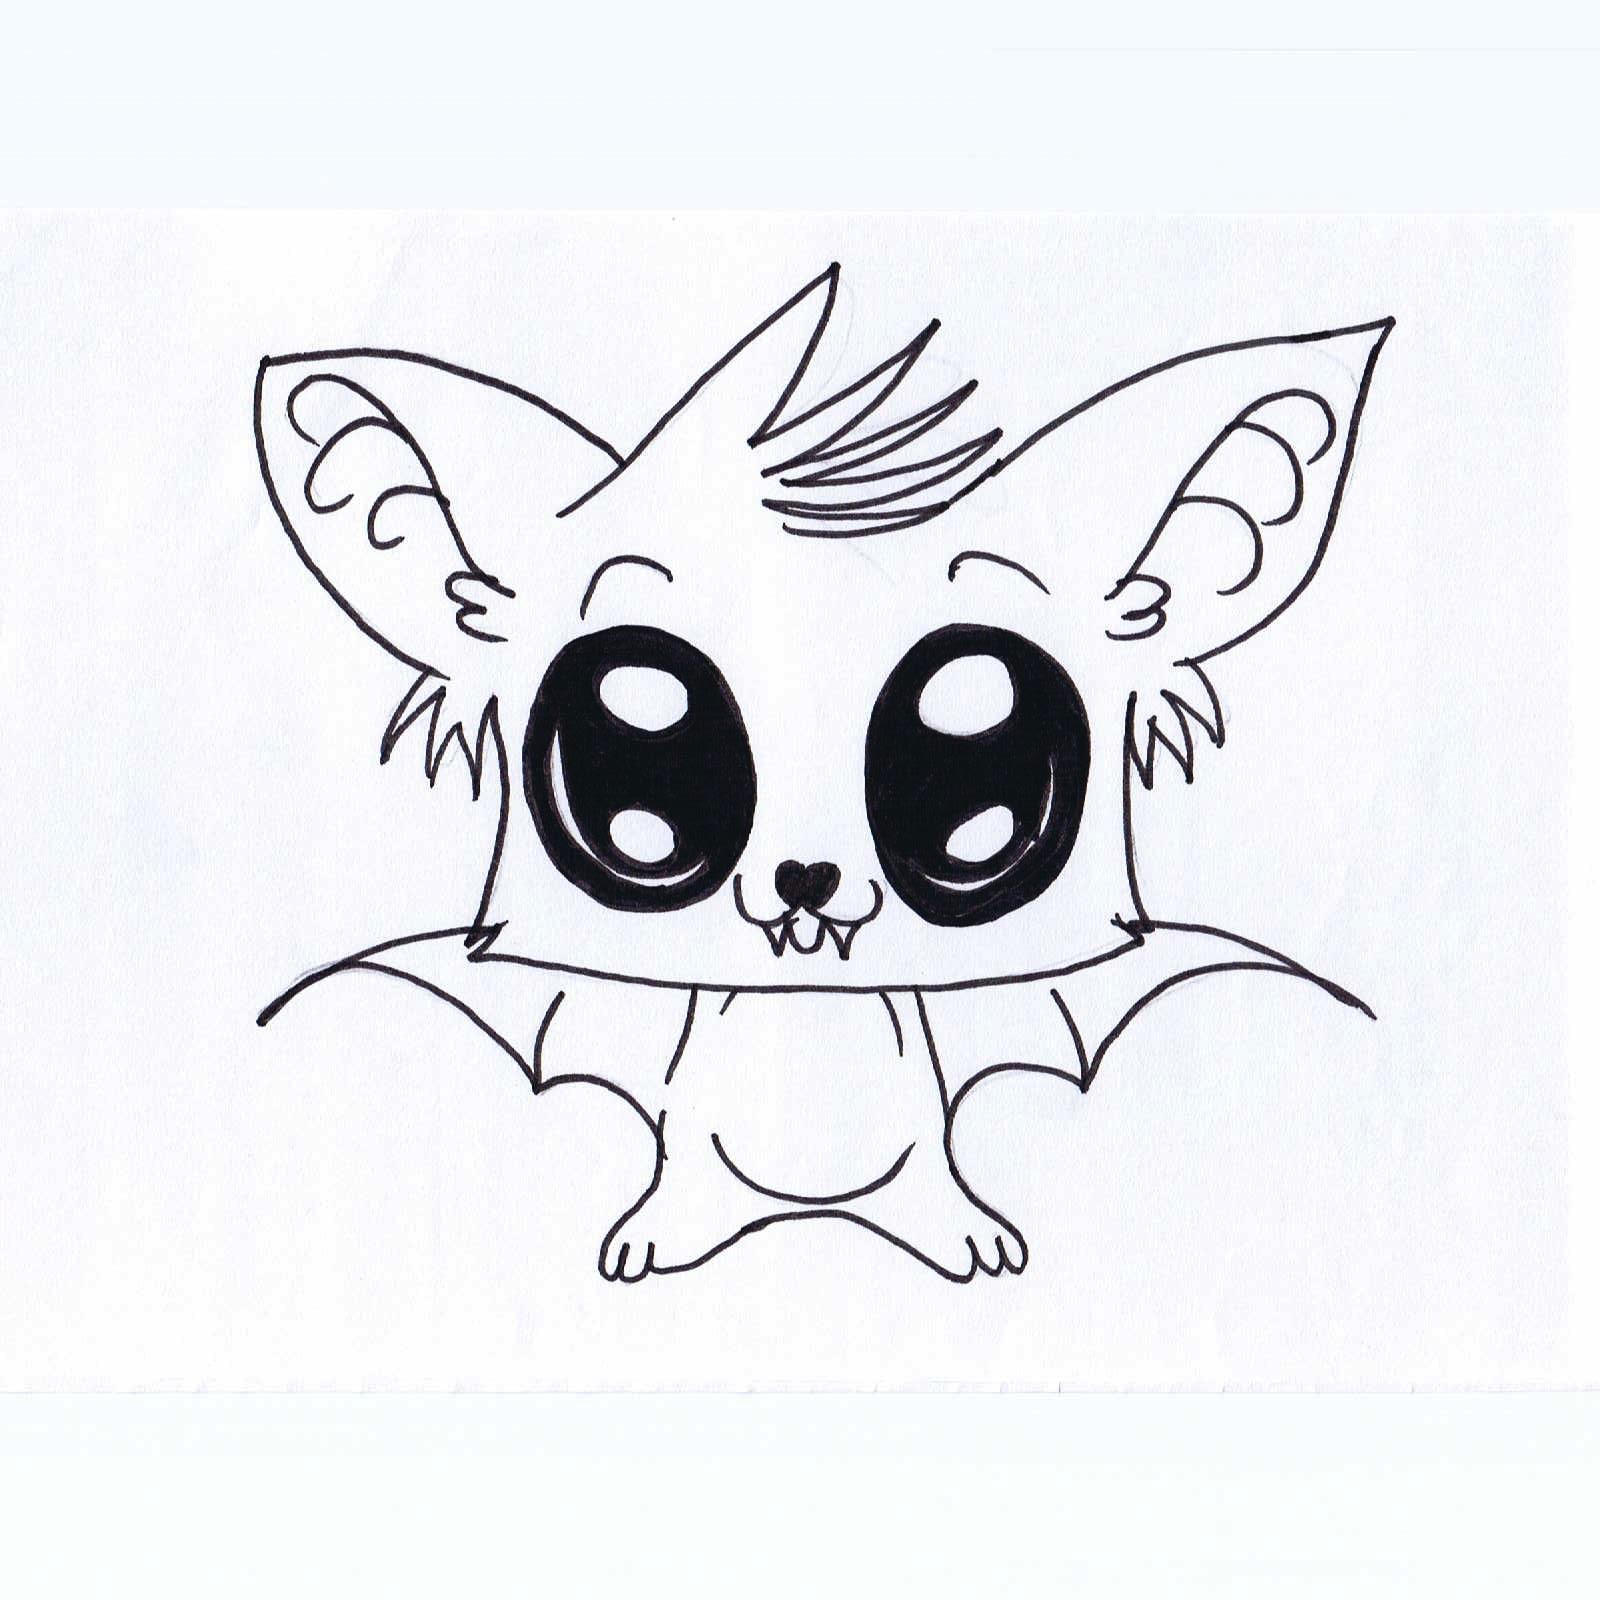 Cute Animal Drawings - HD Photos Gallery - Clip Art Library